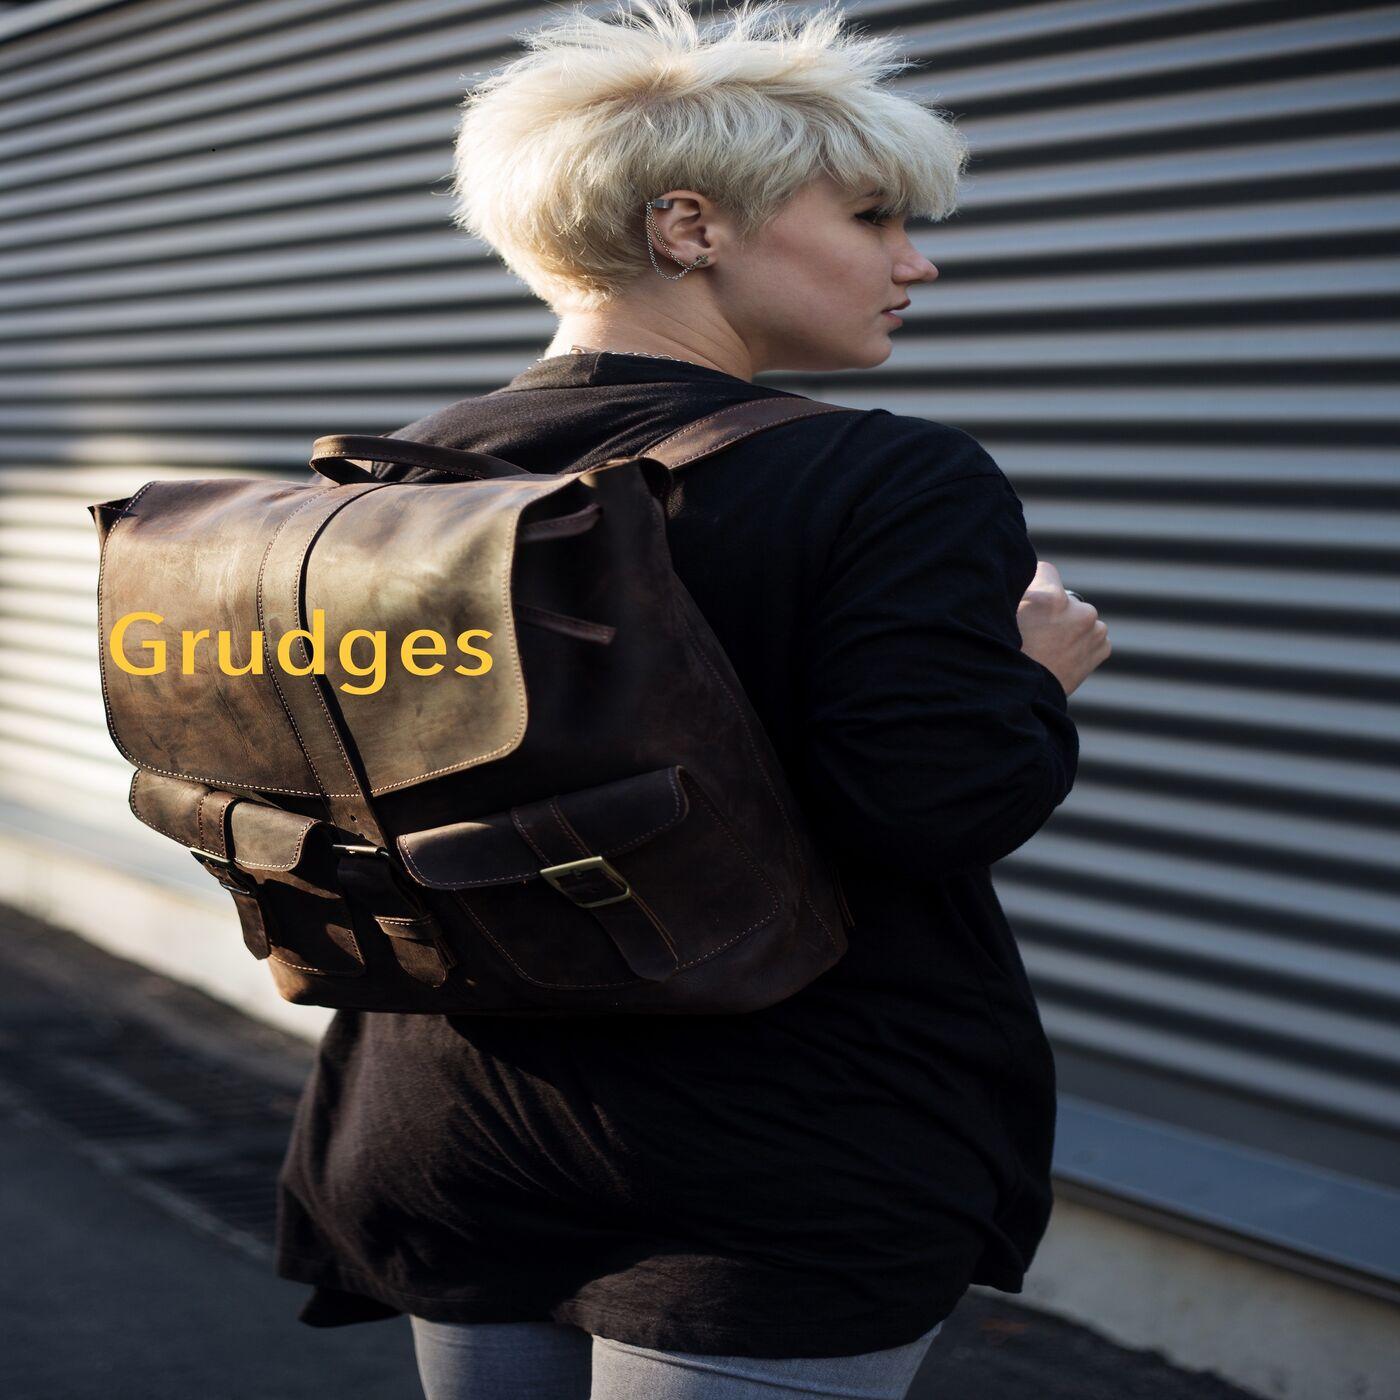 Grudge Pack - Episode #40